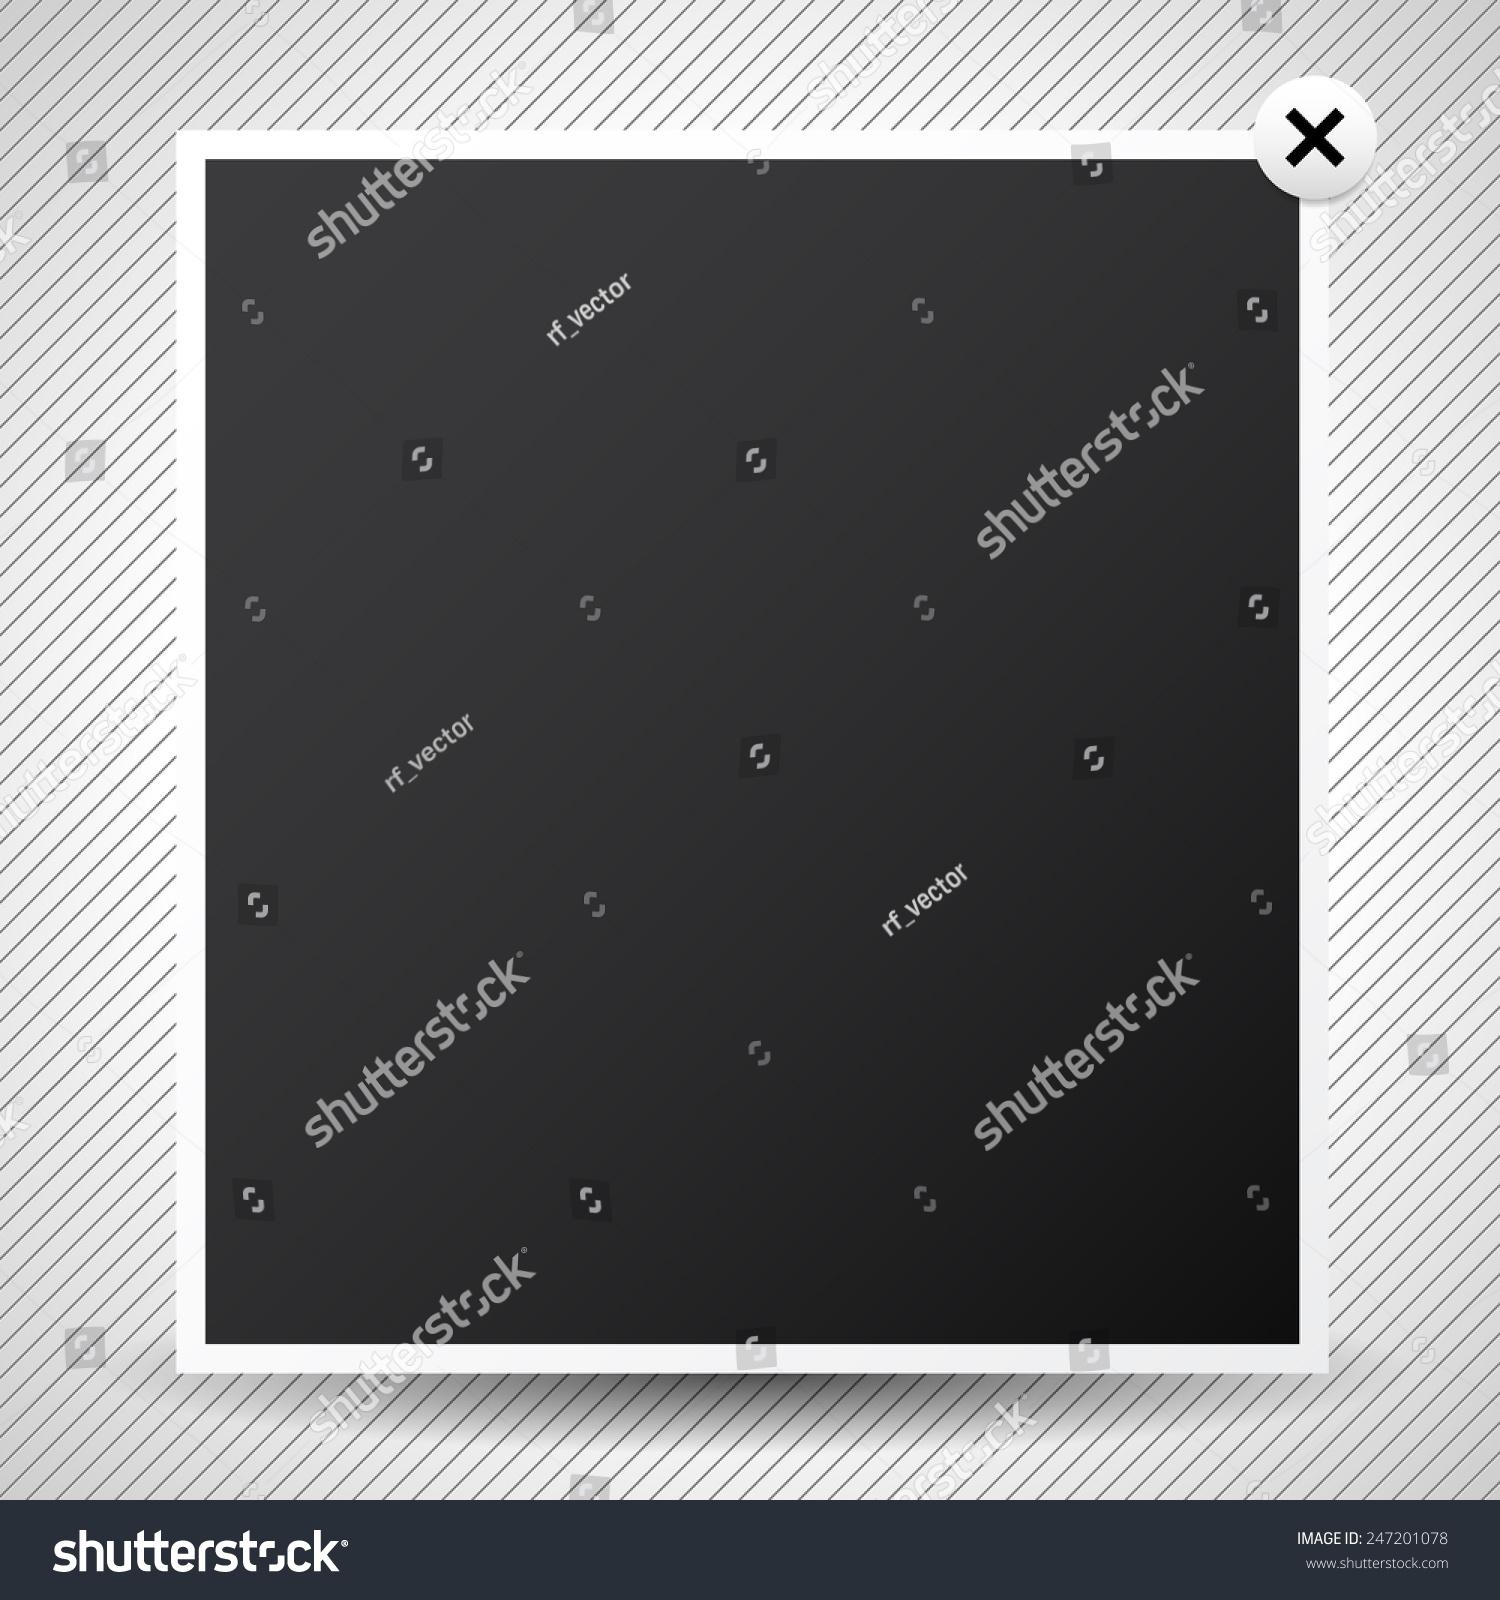 Light box pop up window web design element stock vector for Pop up window design inspiration